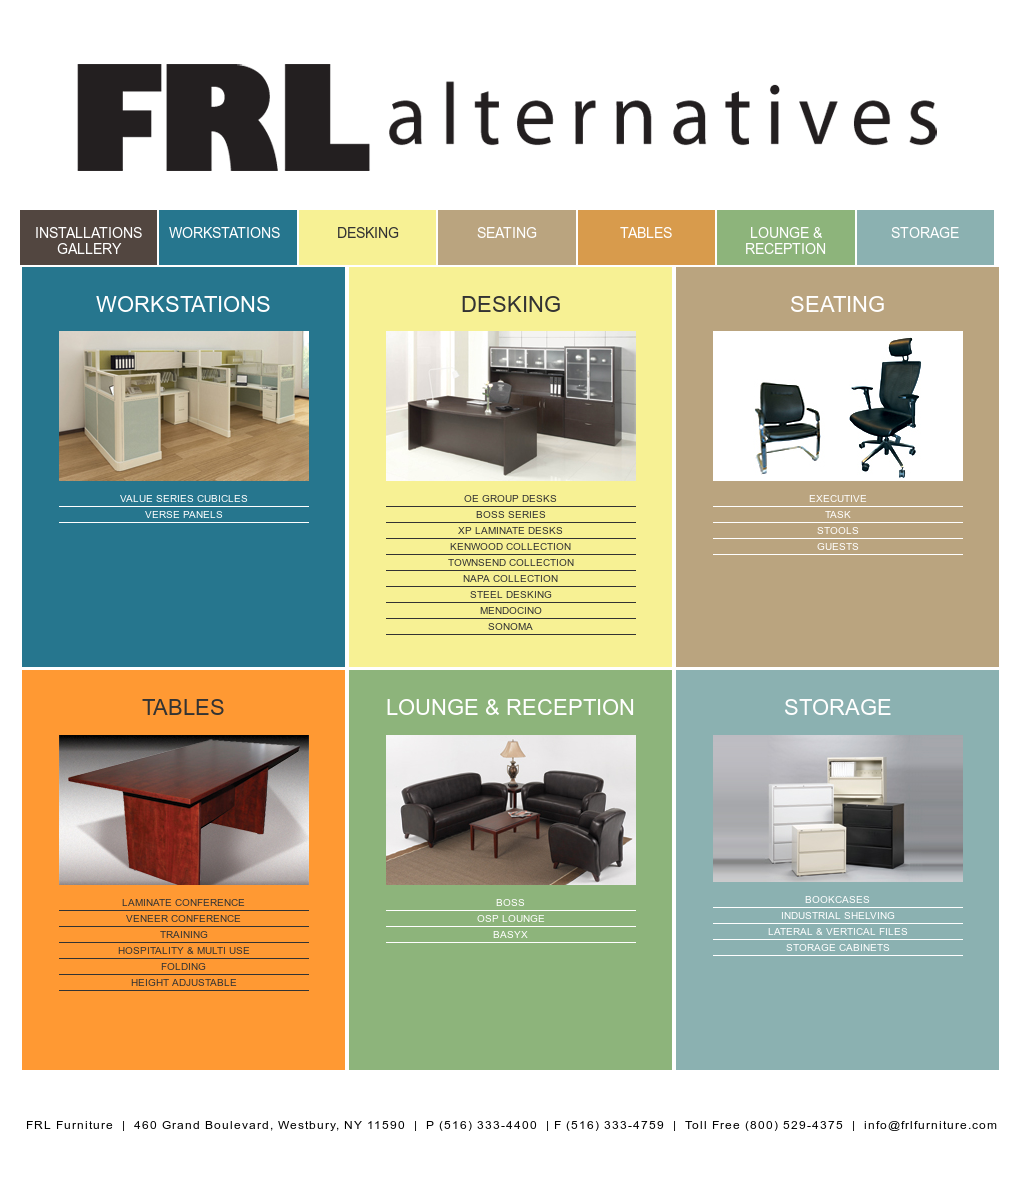 Charmant FRL Furnitureu0027s Website Screenshot On May 2017